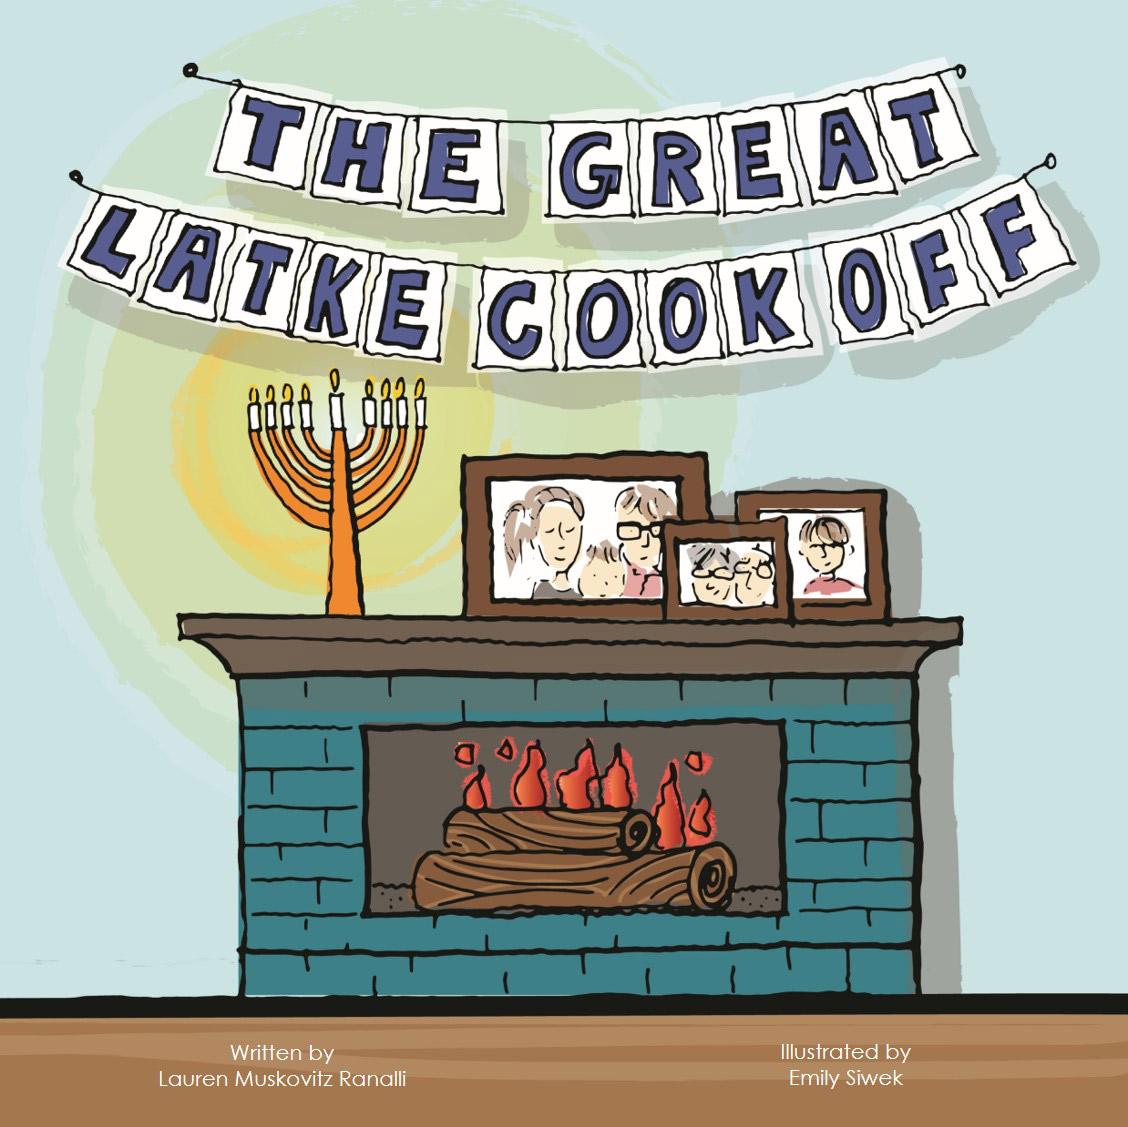 Great latke cook off